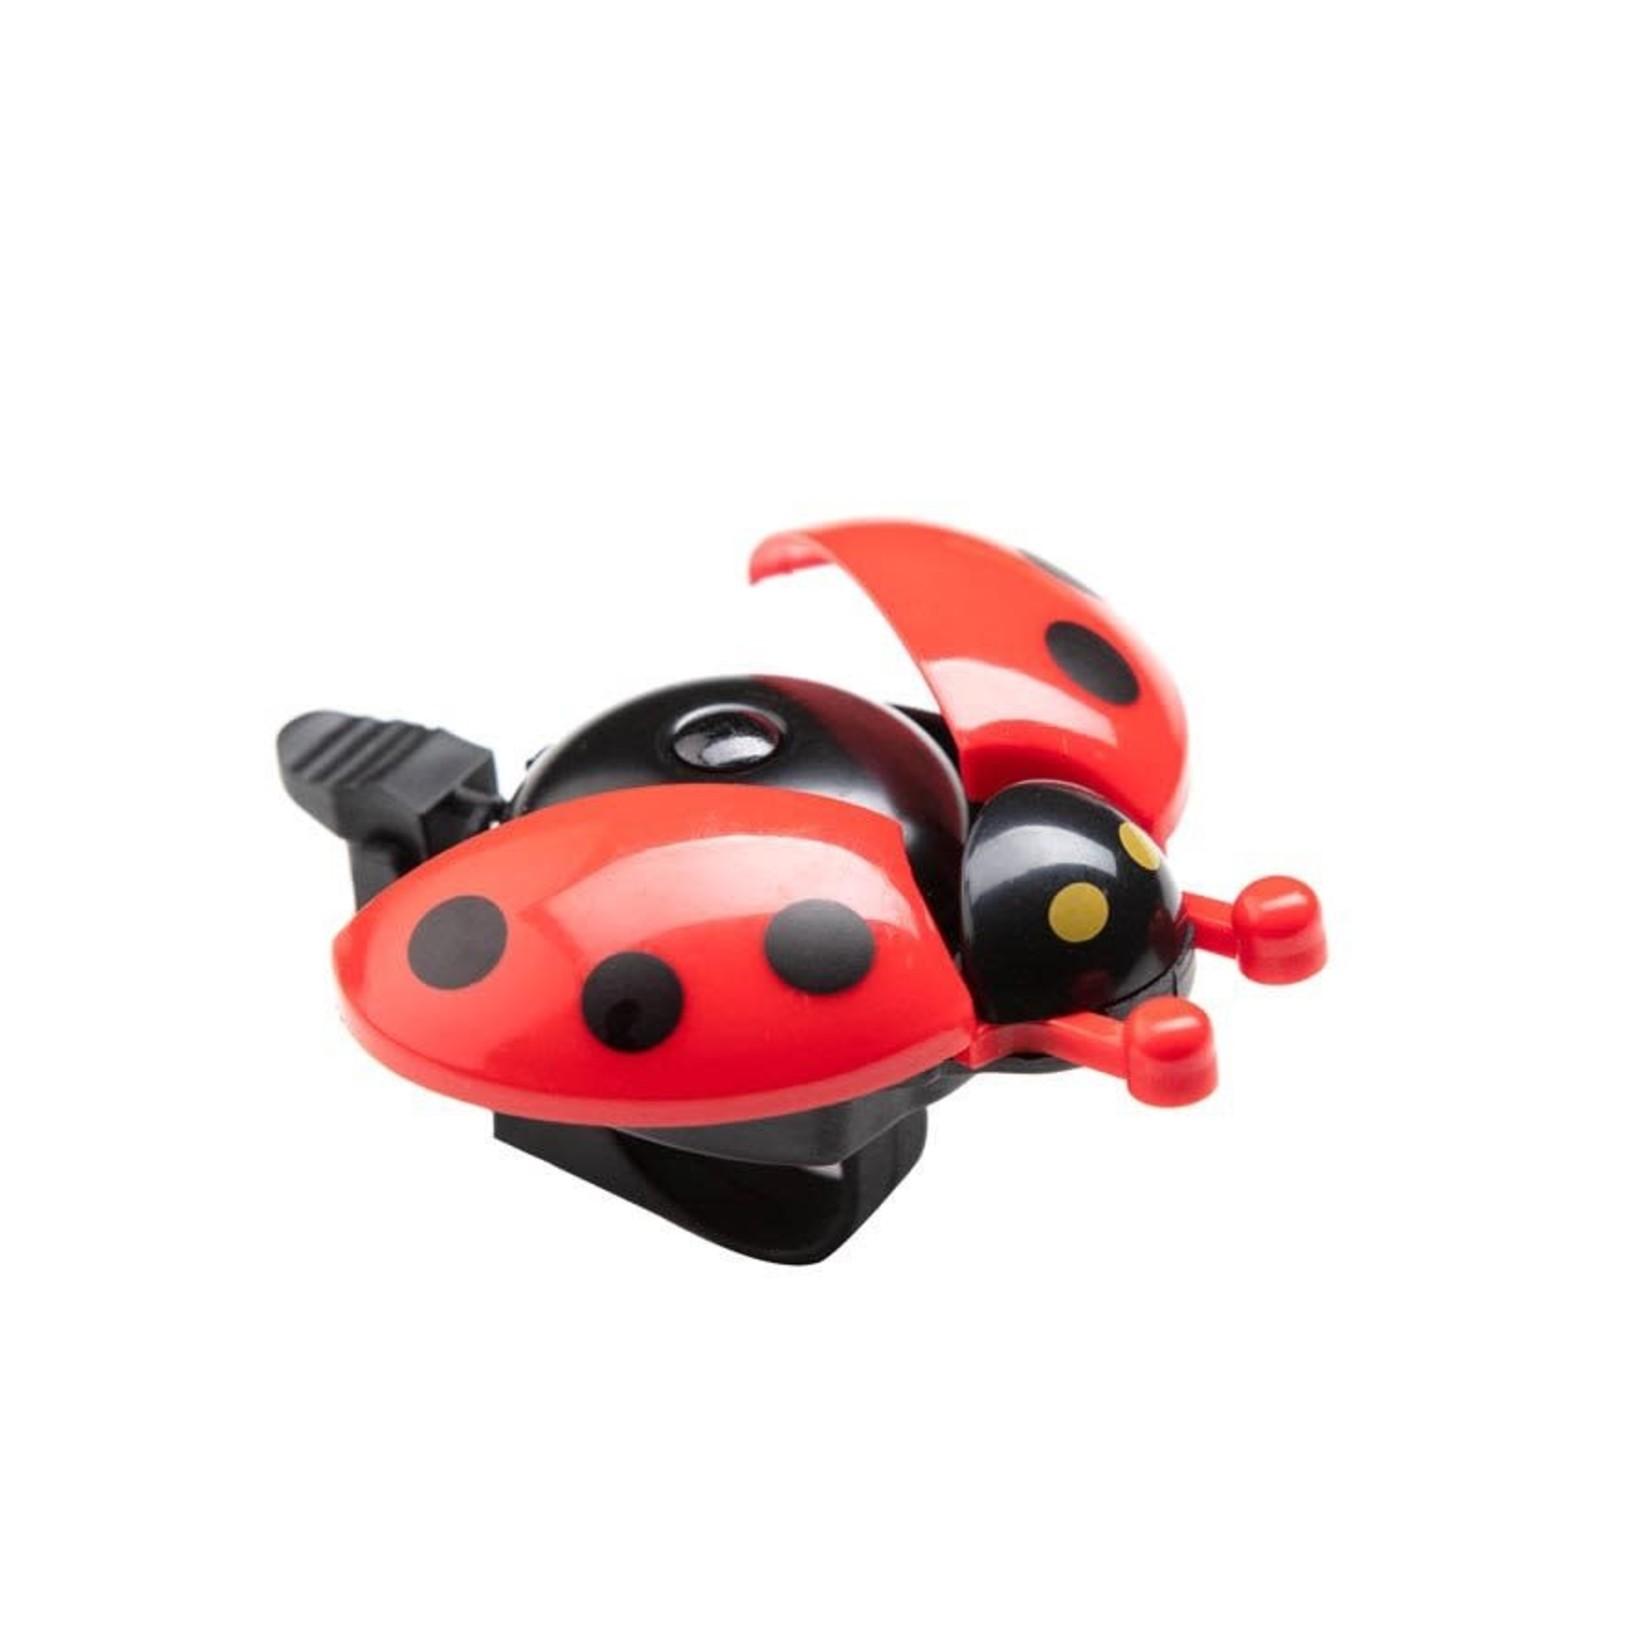 Evo Ring-A-Ling Bell Ladybug